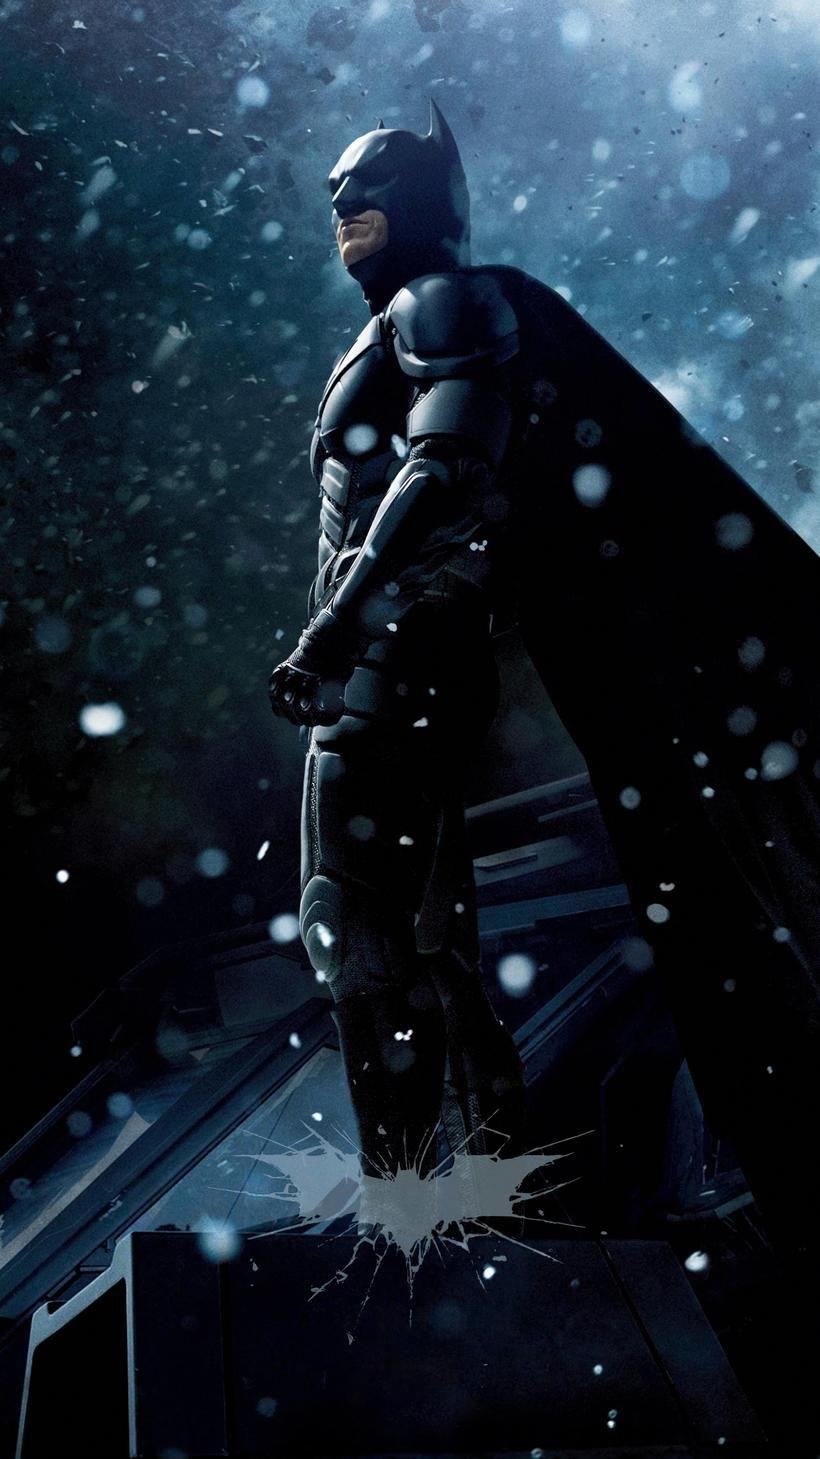 The Dark Knight Rises 2012 Phone Wallpaper Moviemania Batman